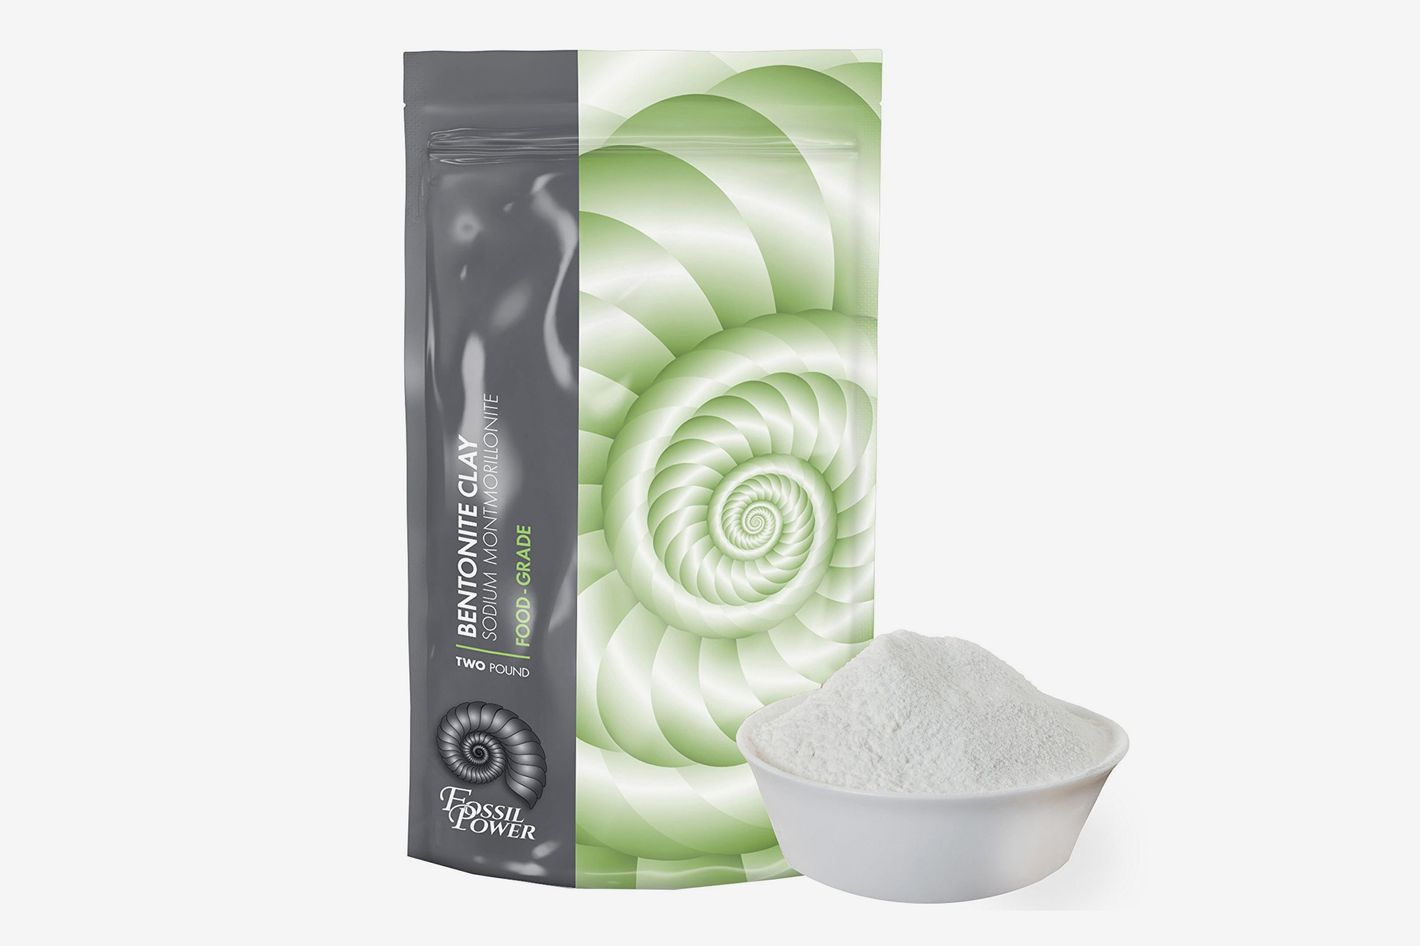 Bentonite Clay Food Grade Powder, 2 pounds